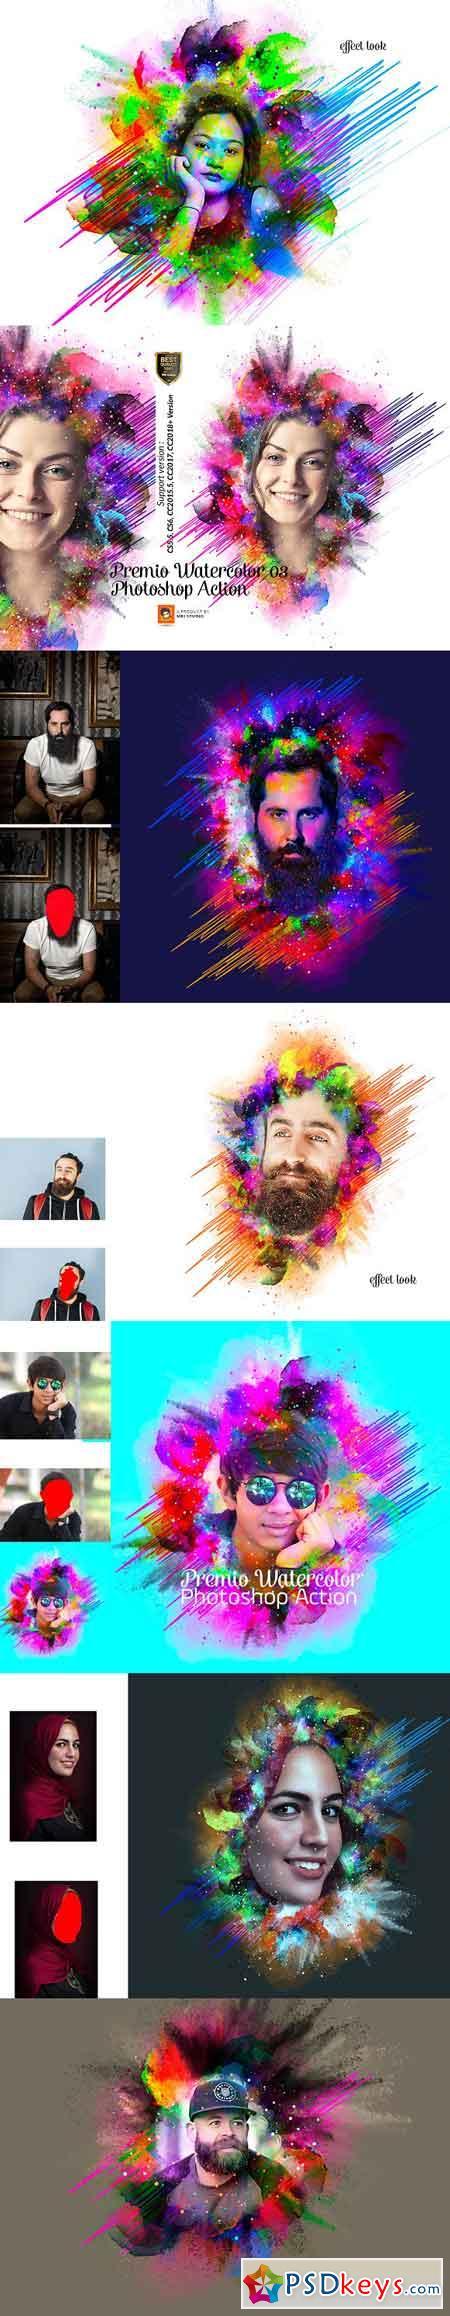 Premio Watercolor Photoshop Action 3235422